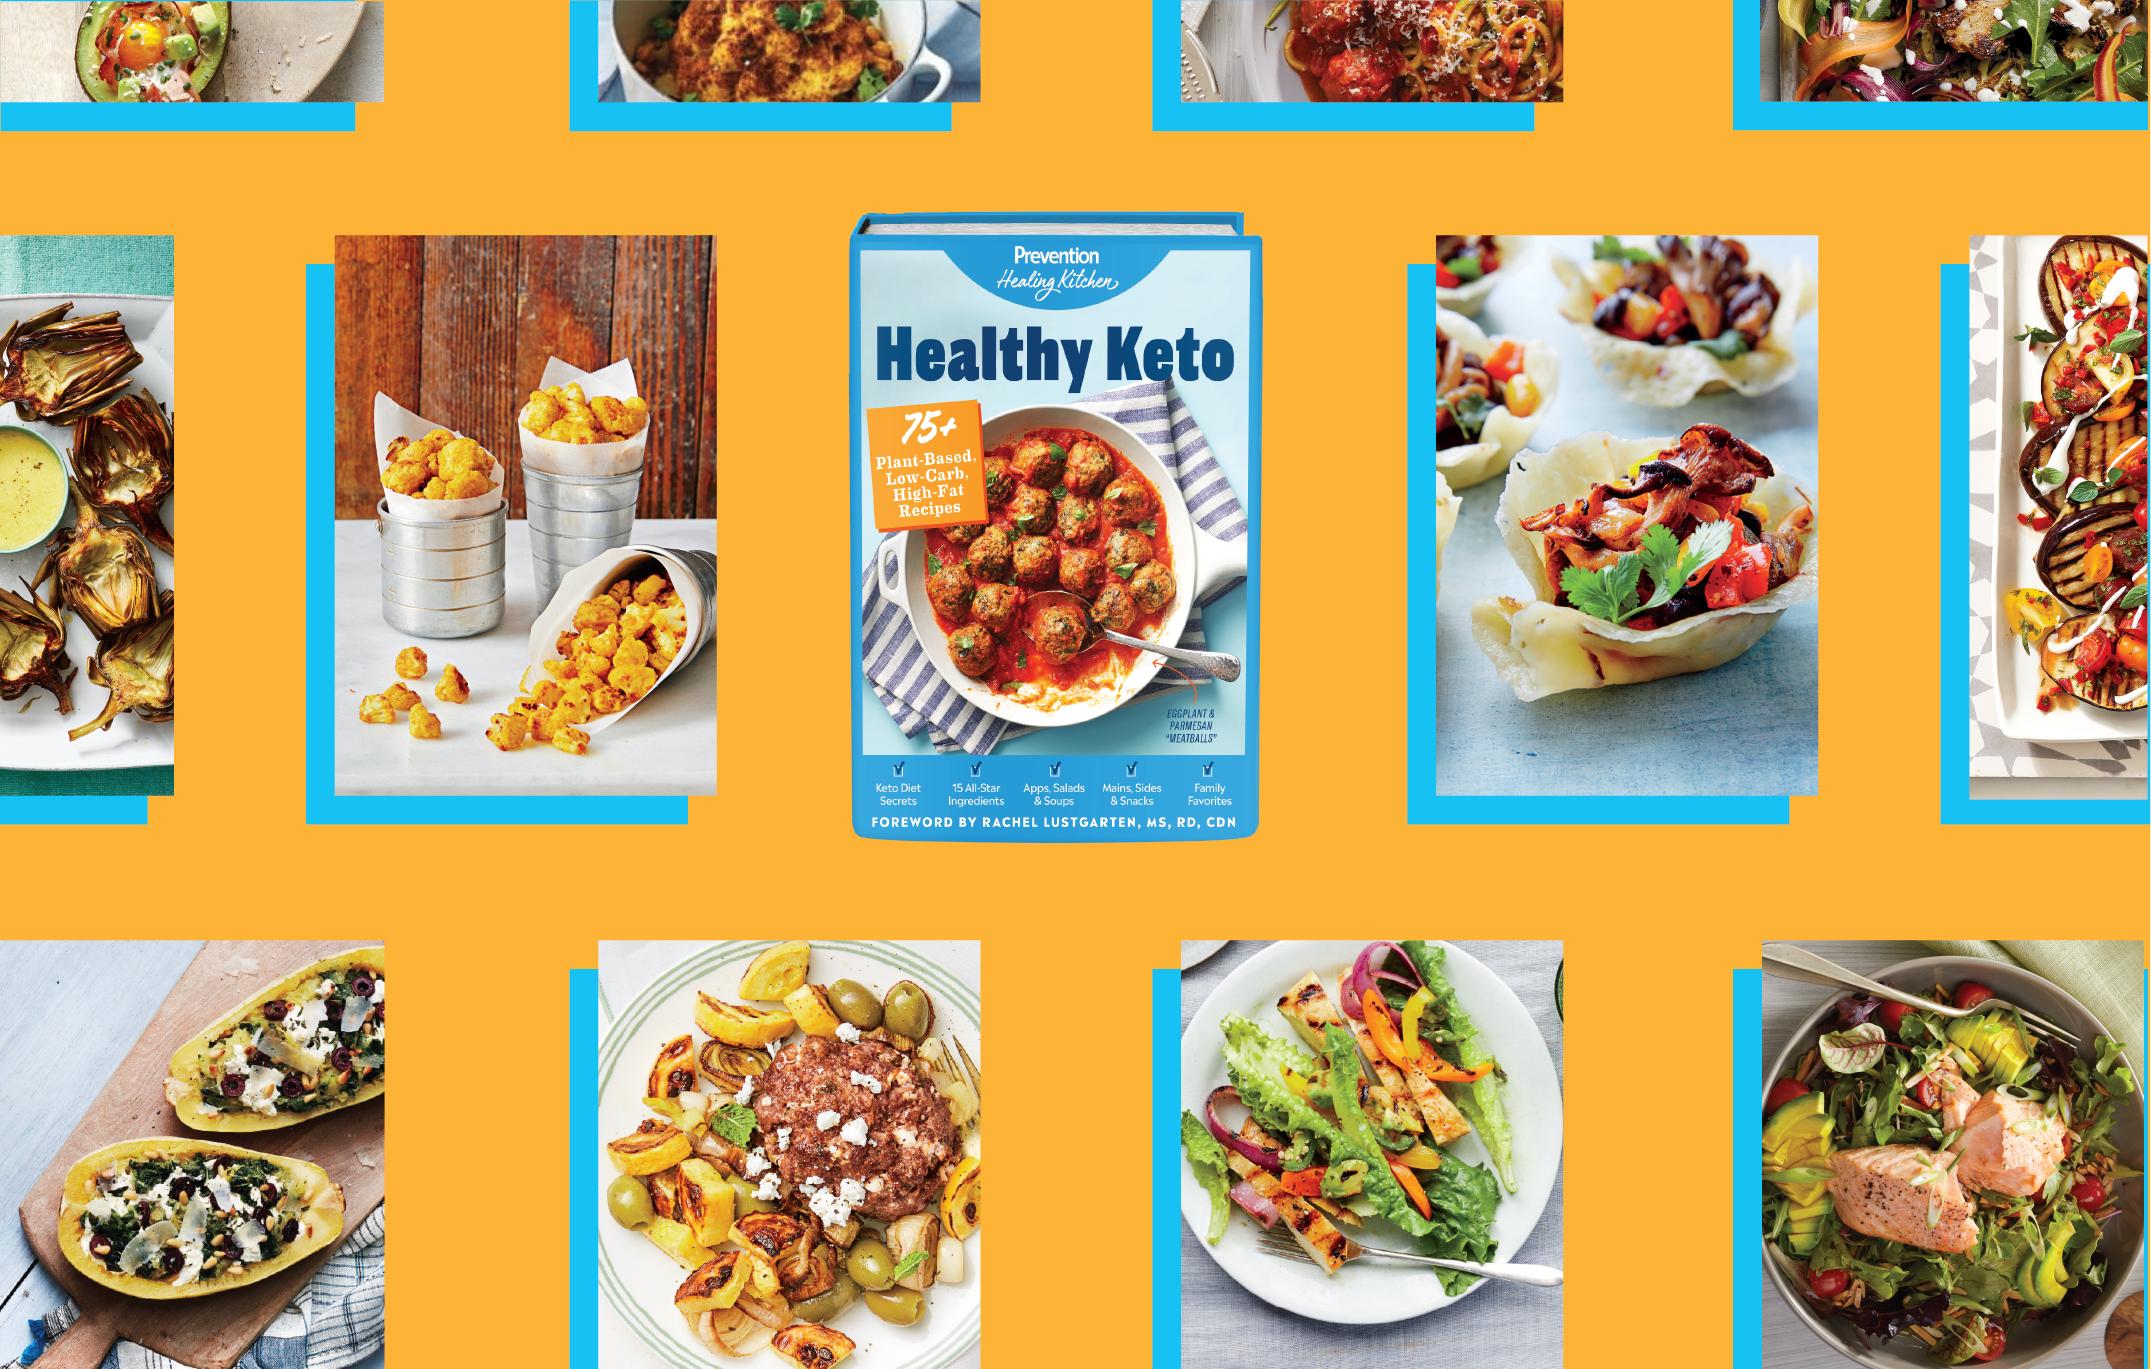 Order The Prevention Healthy Keto Cookbook Best Keto Cookbook